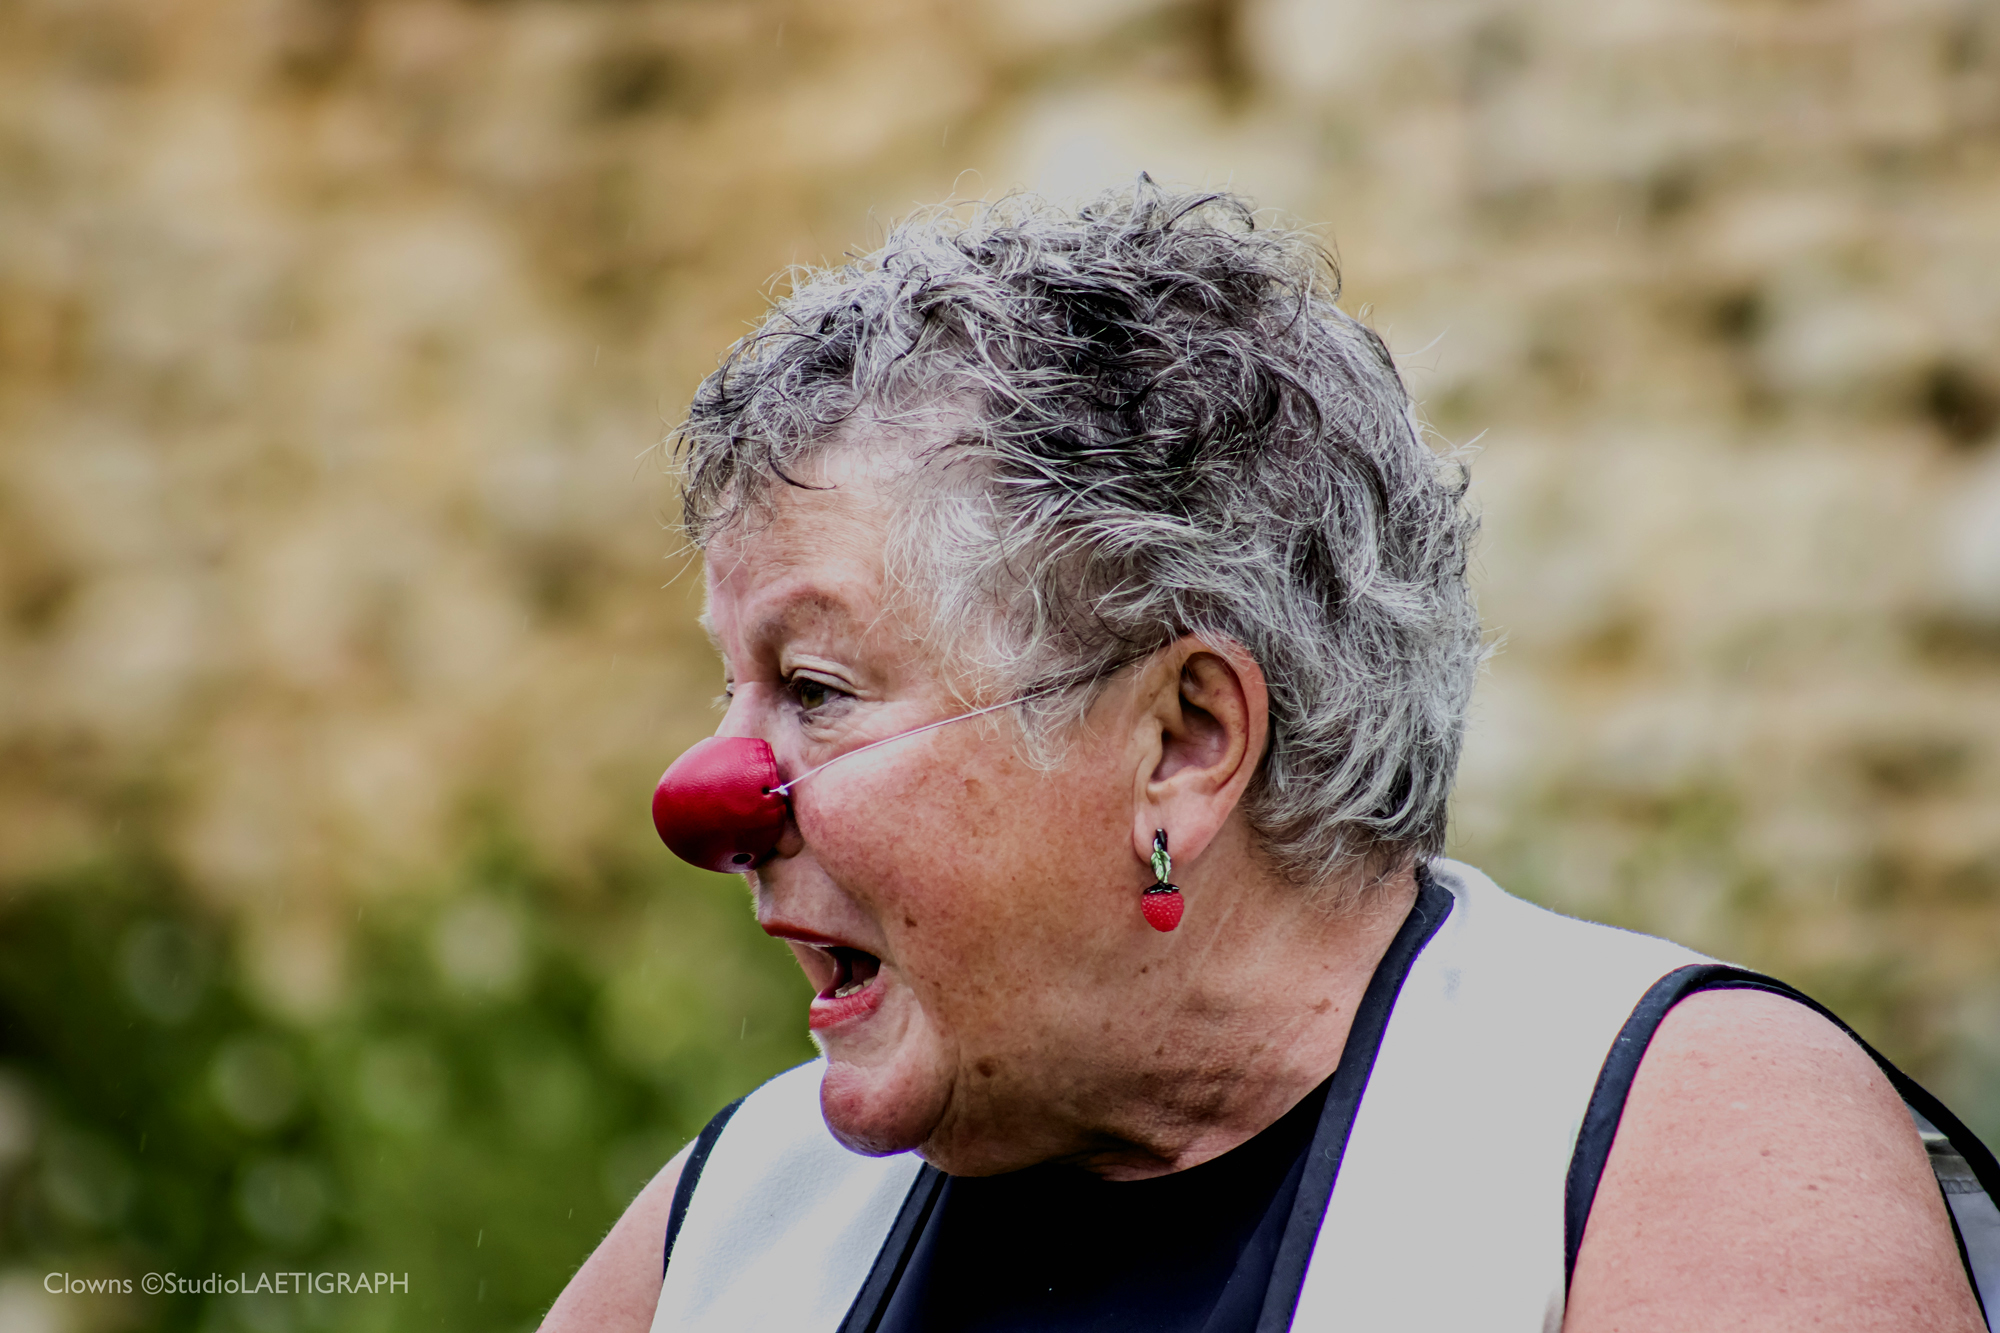 LMDCB21_clowns-54_1